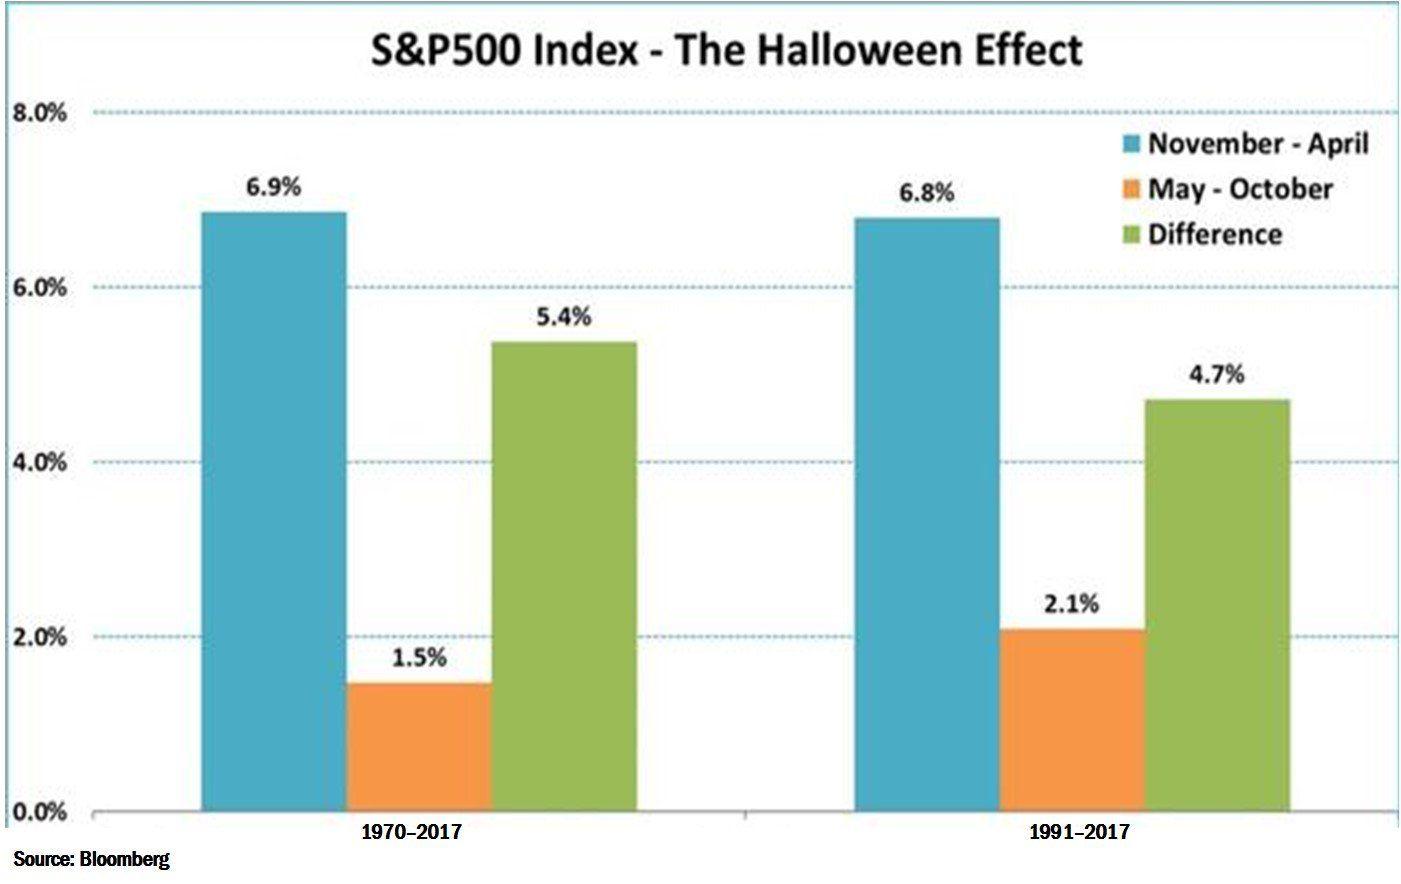 Halloween Effect